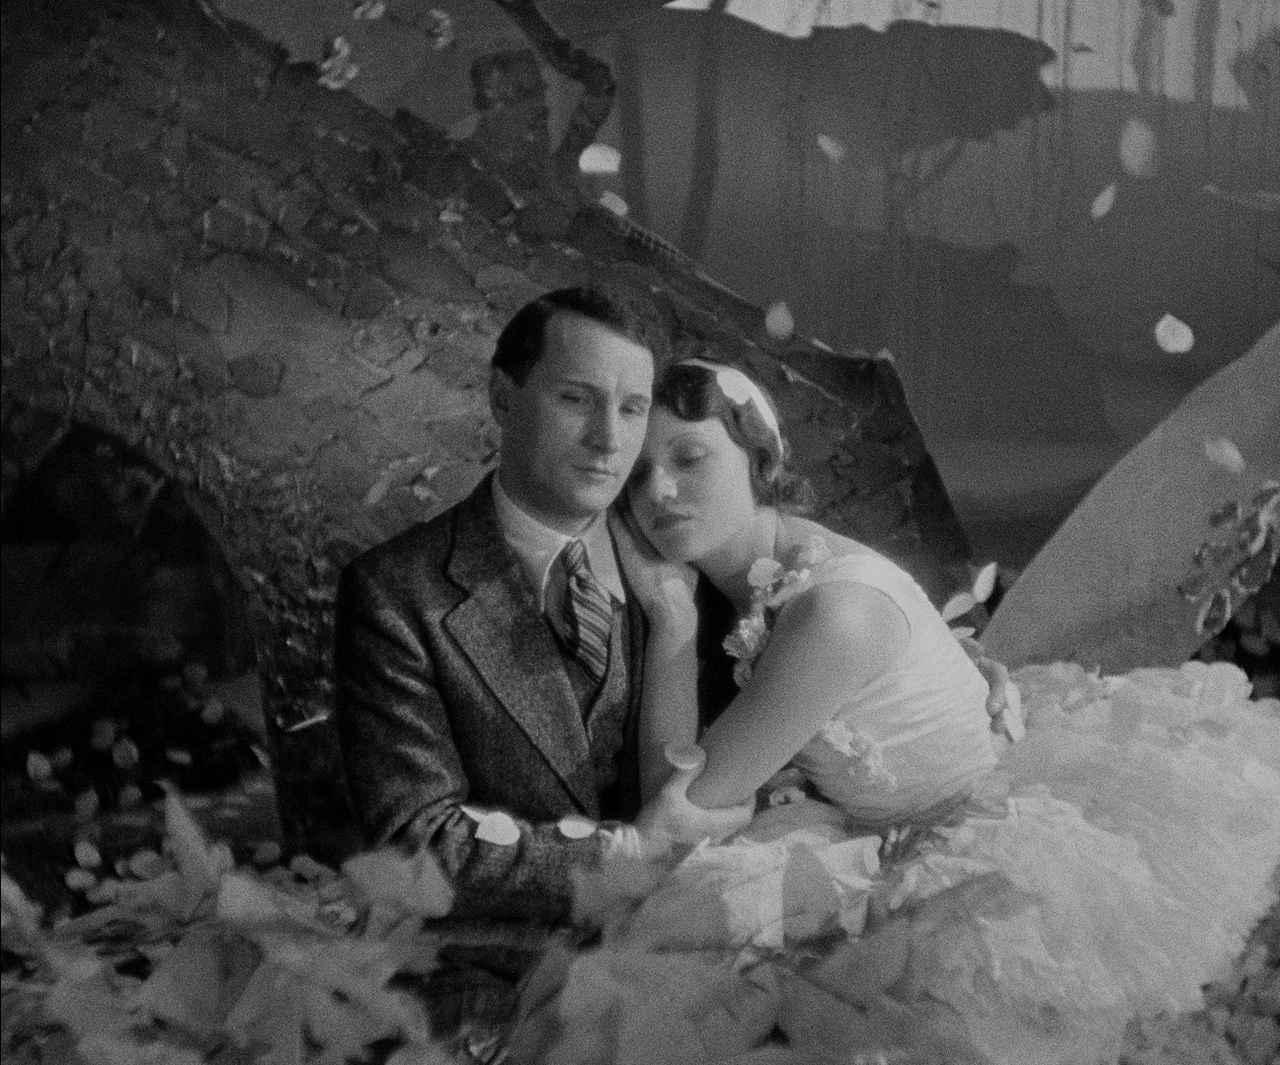 画像: © 1931 - TF1 INTERNATIONAL - SOCIETÉ DES FILMS - SONORES TOBIS